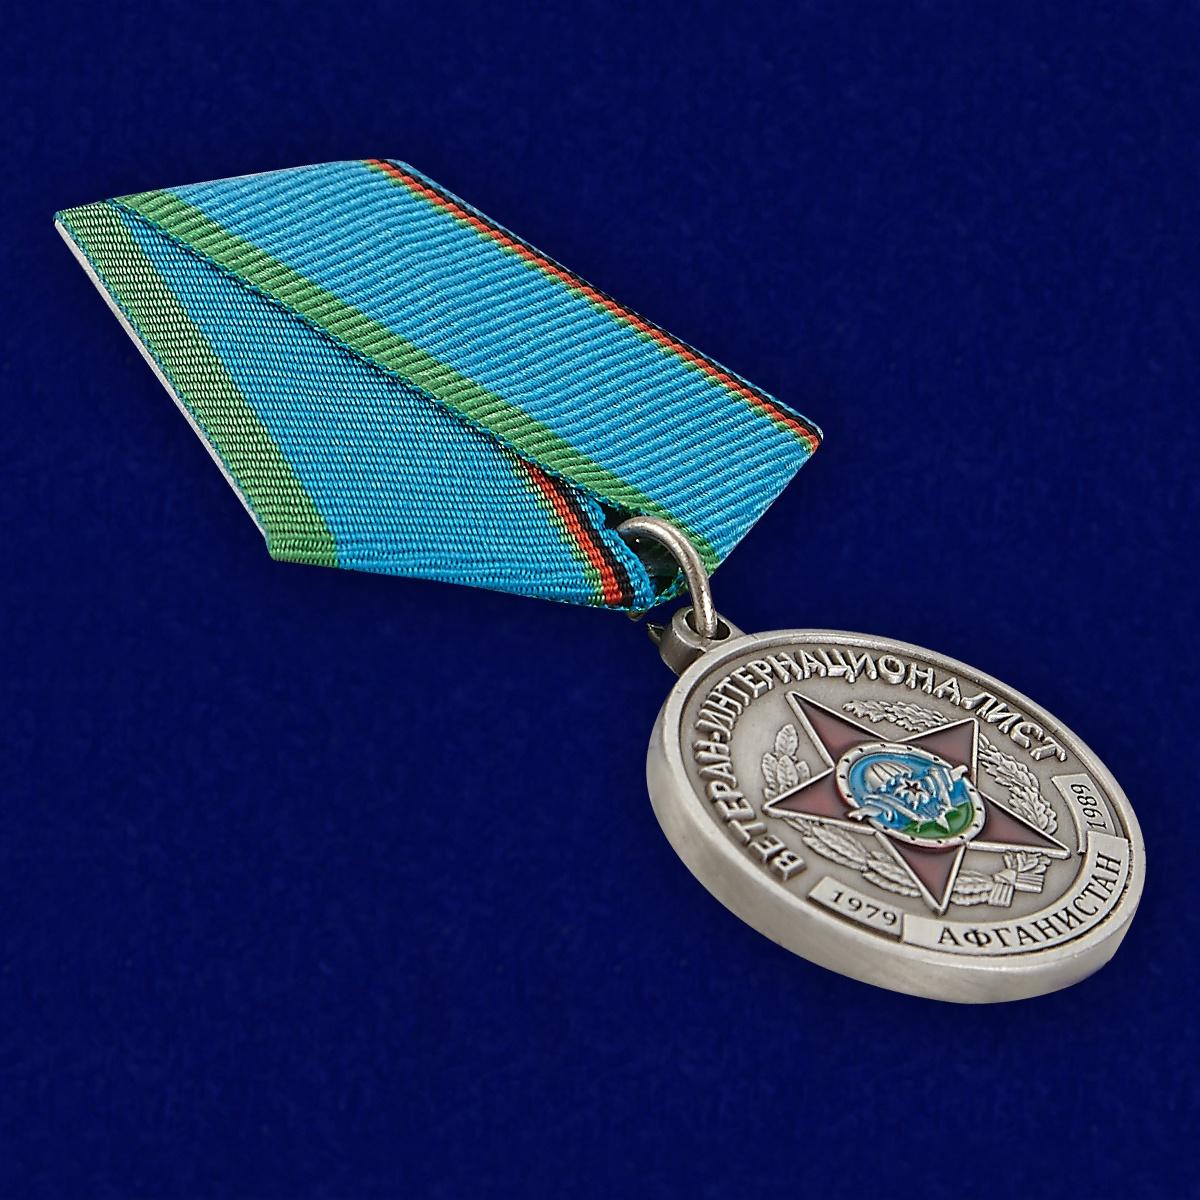 Медаль «Ветеран-интернационалист» Афганистан - вид под углом